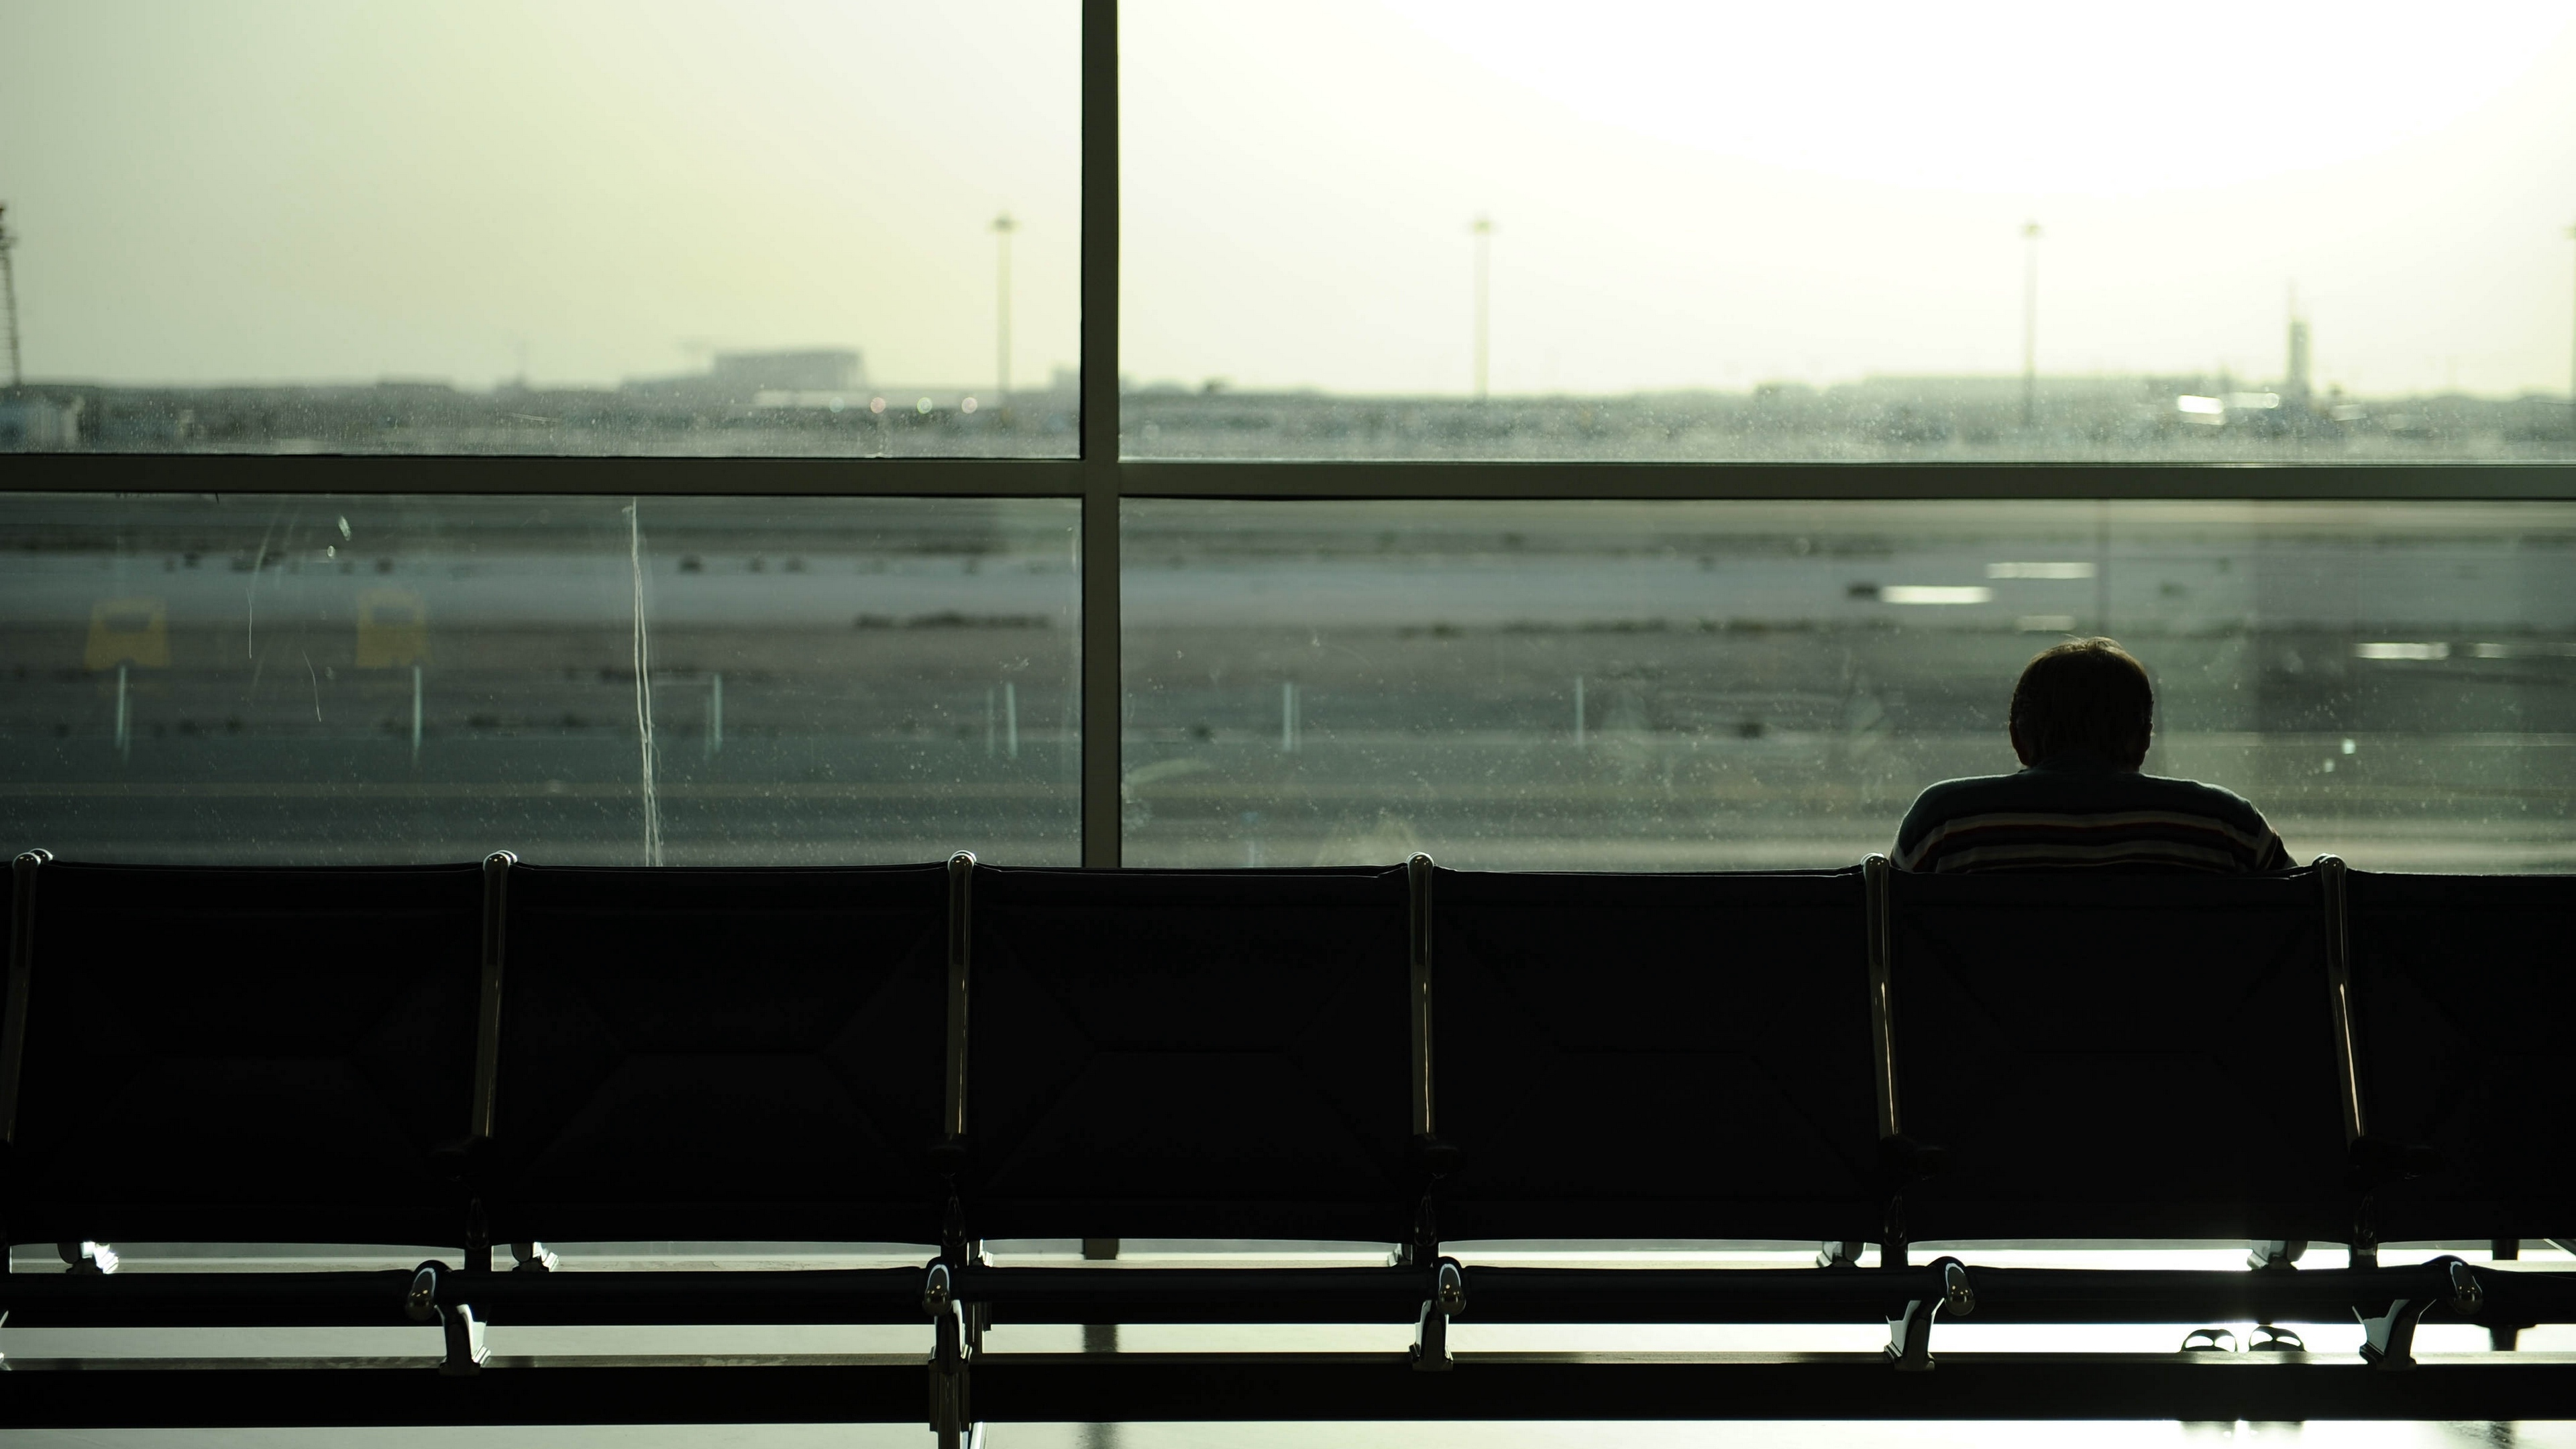 people airport waiting 4k 1540575222 - people, airport, waiting 4k - Waiting, People, airport